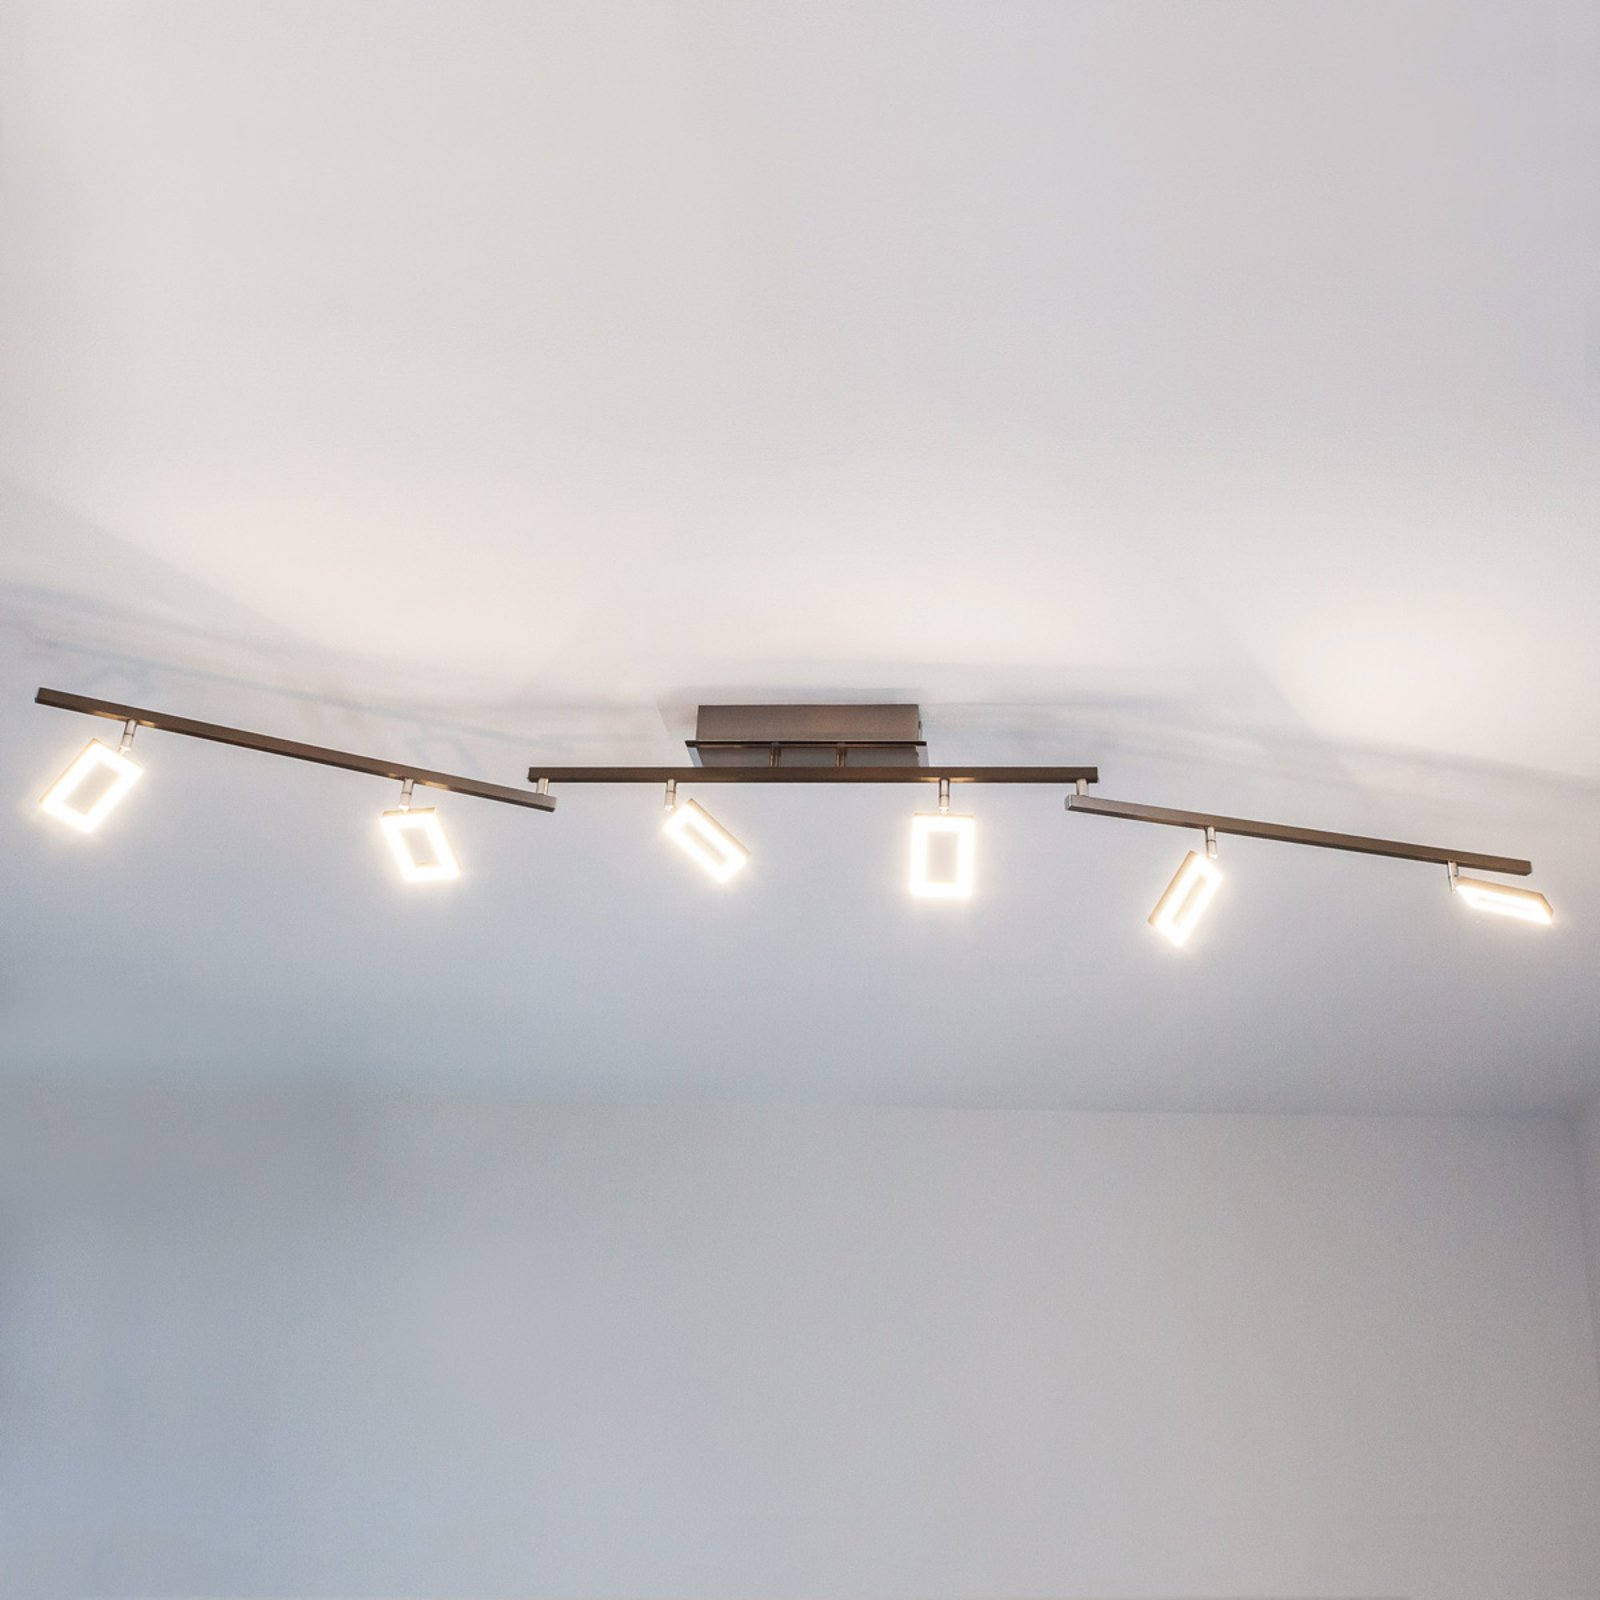 Toppmoderne LED-taklampe Inigo, seks lys